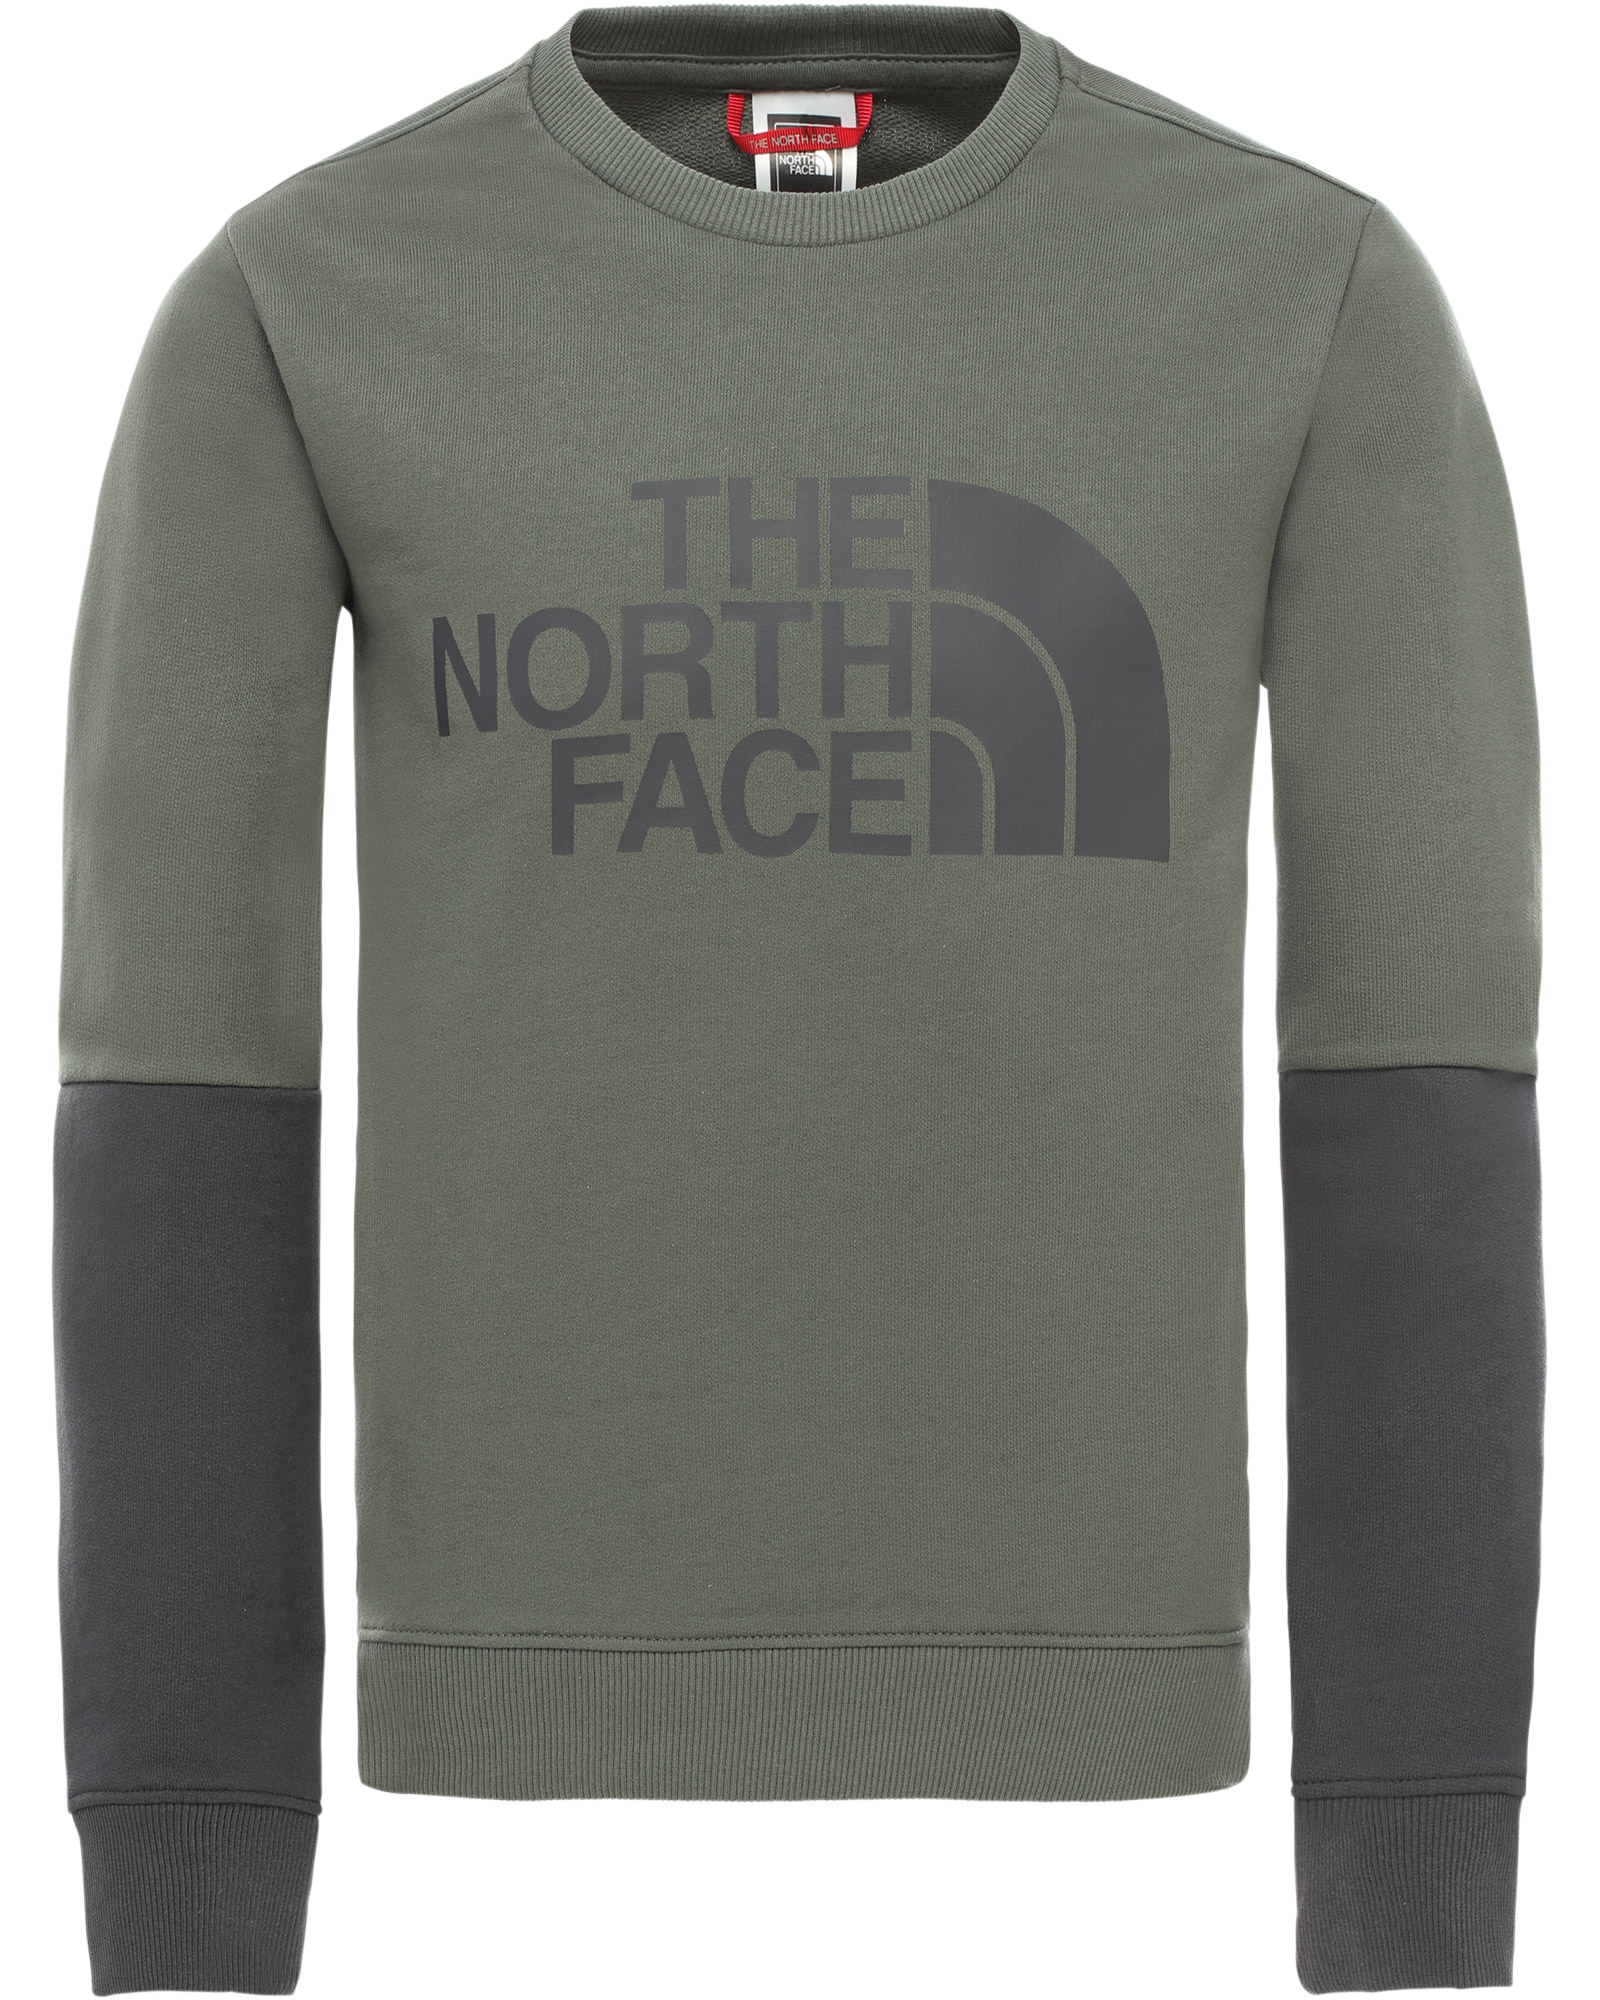 The North Face Youth Drew Peak Light Crew XL 0